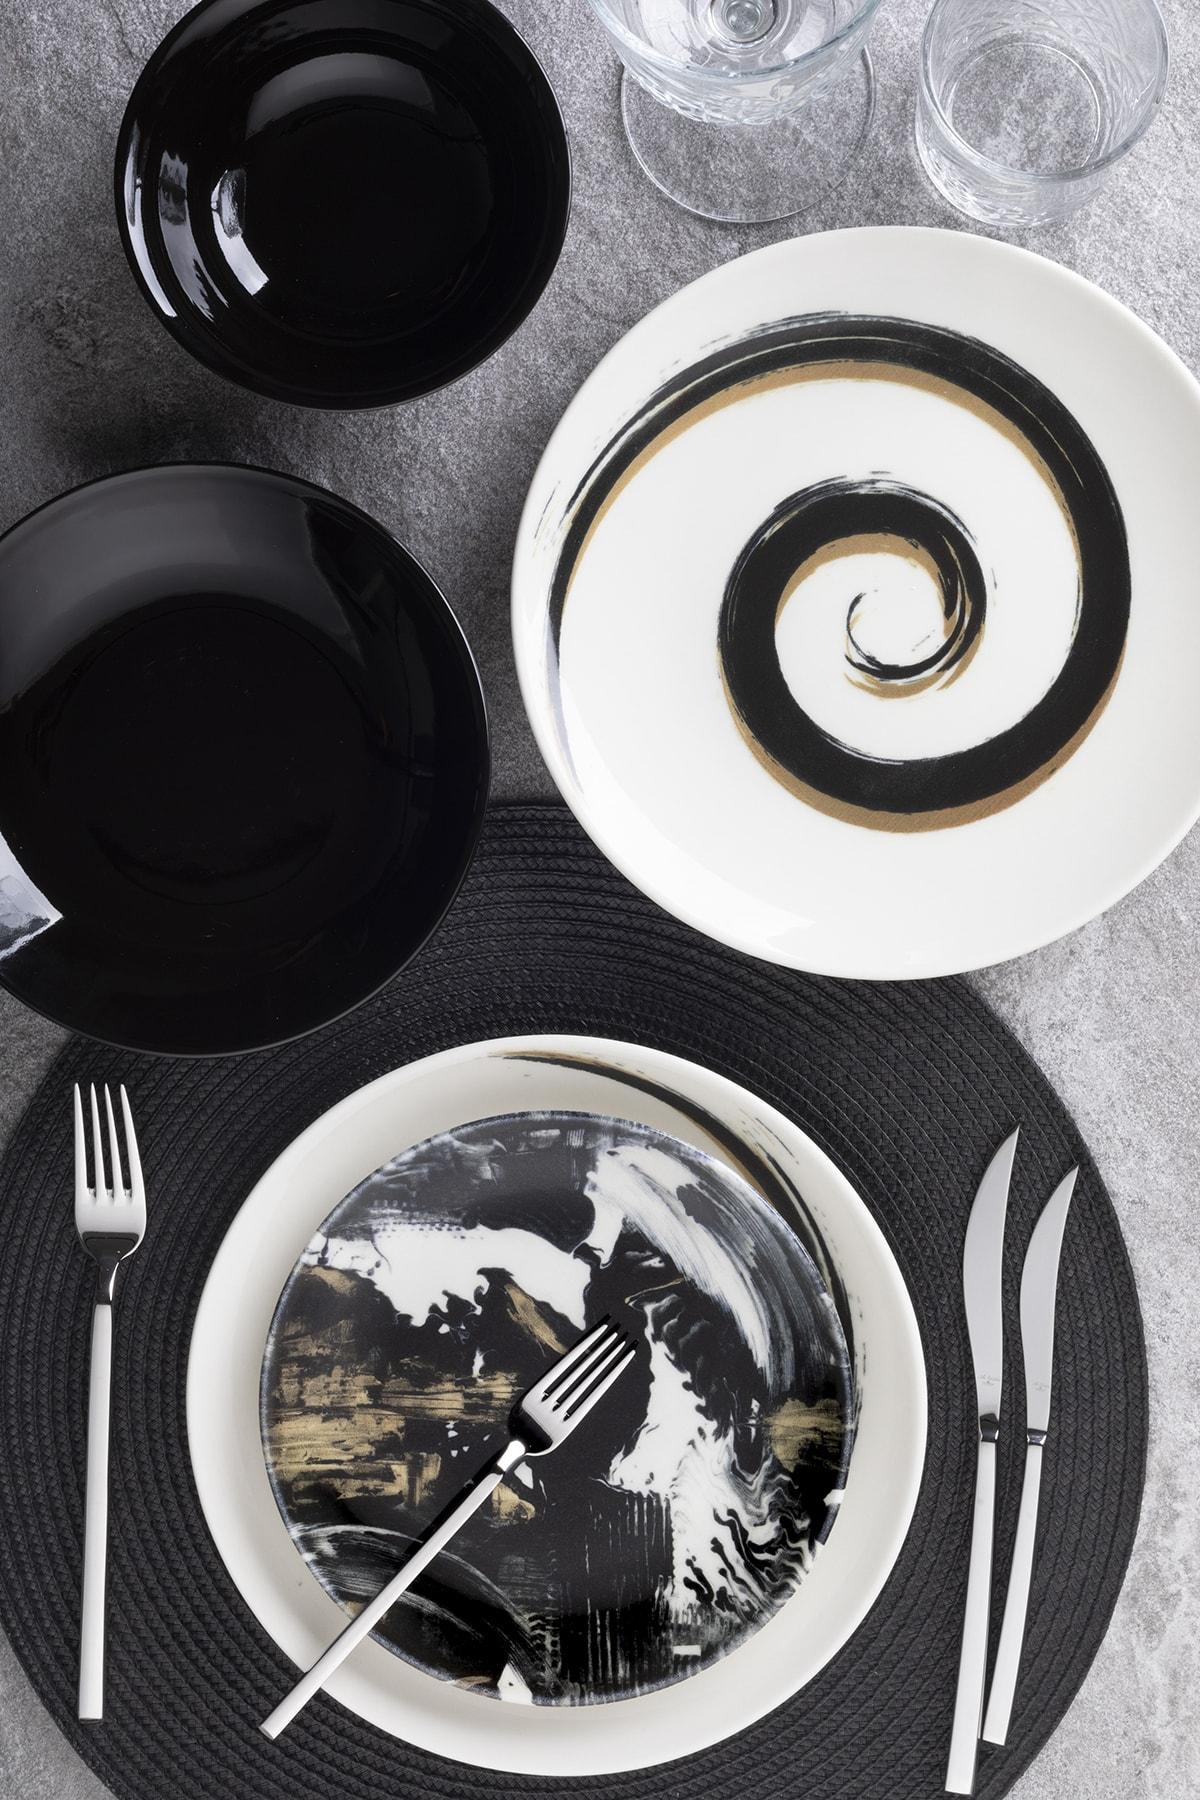 24 piece Dinner set dinnerware set dish set